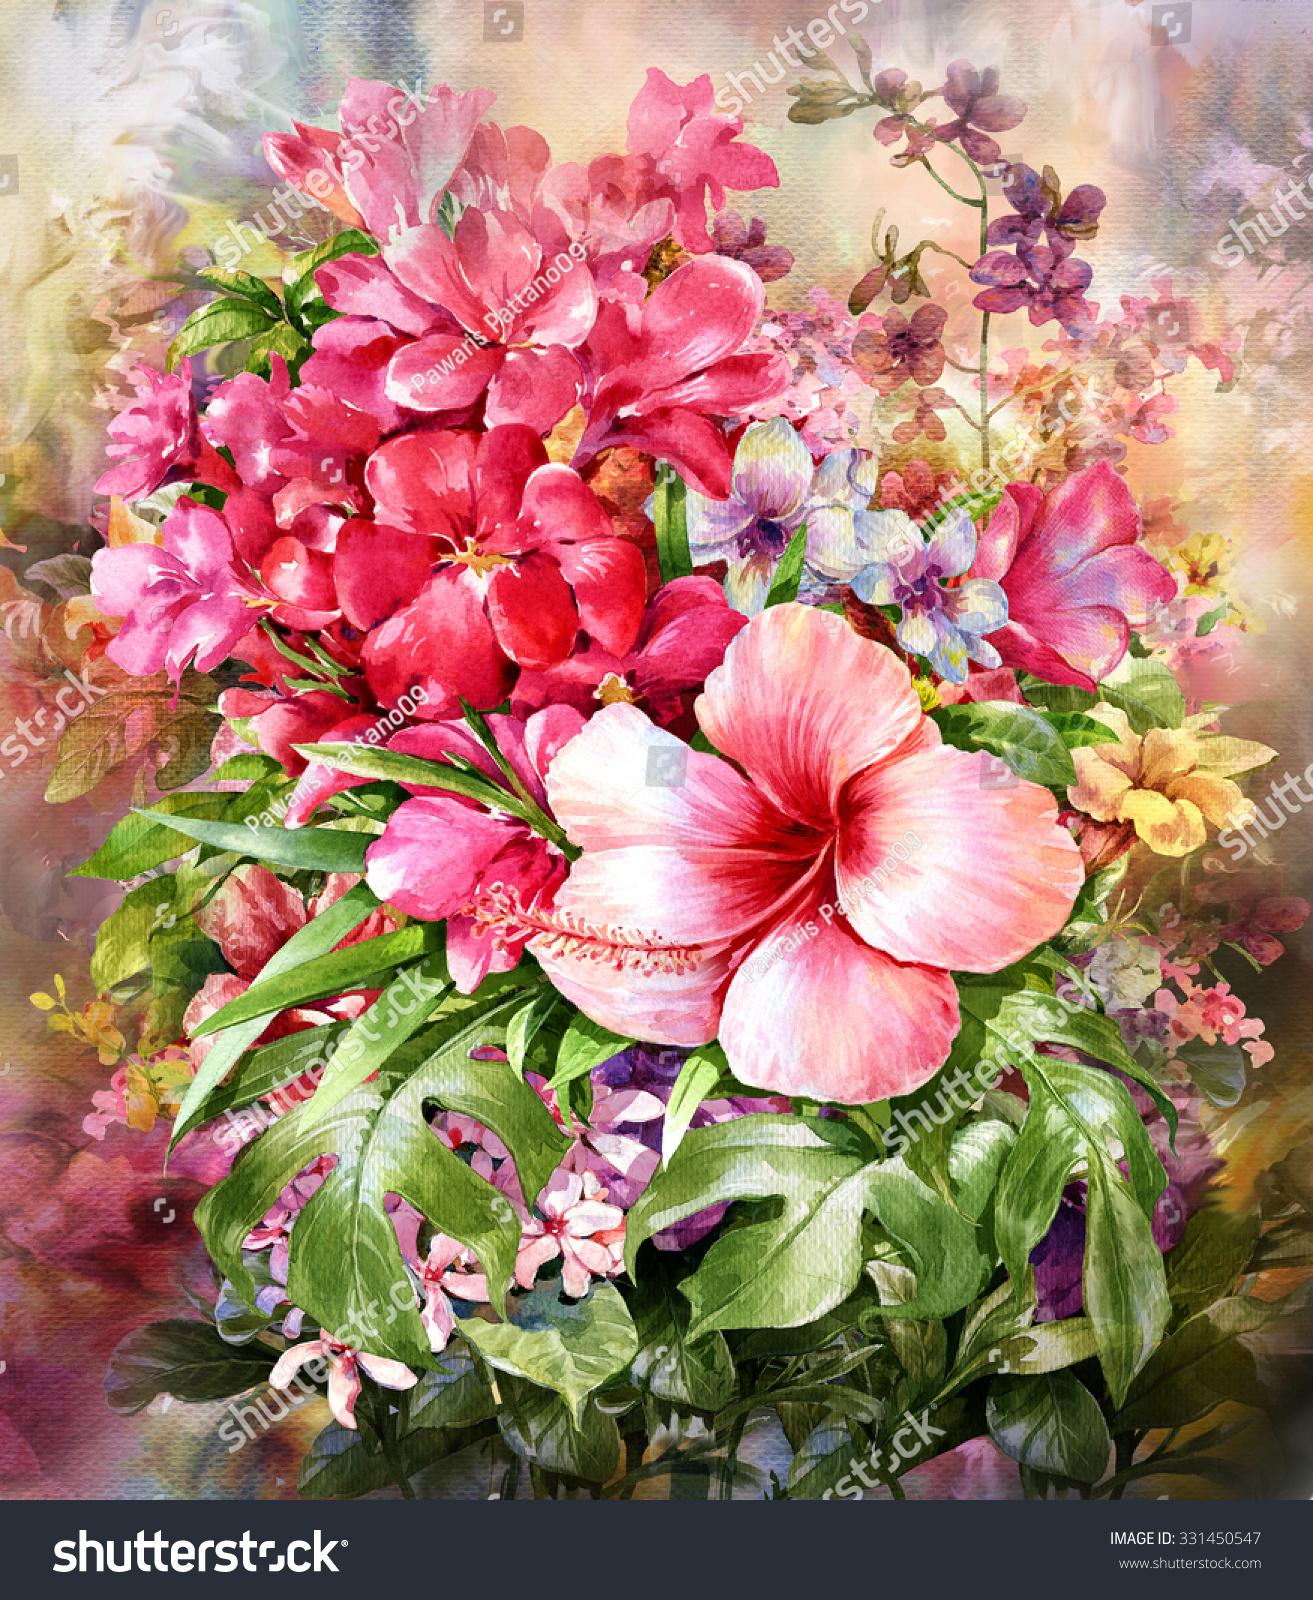 Bouquet Multicolored Flowers Watercolor Painting Styledigital Stock ...